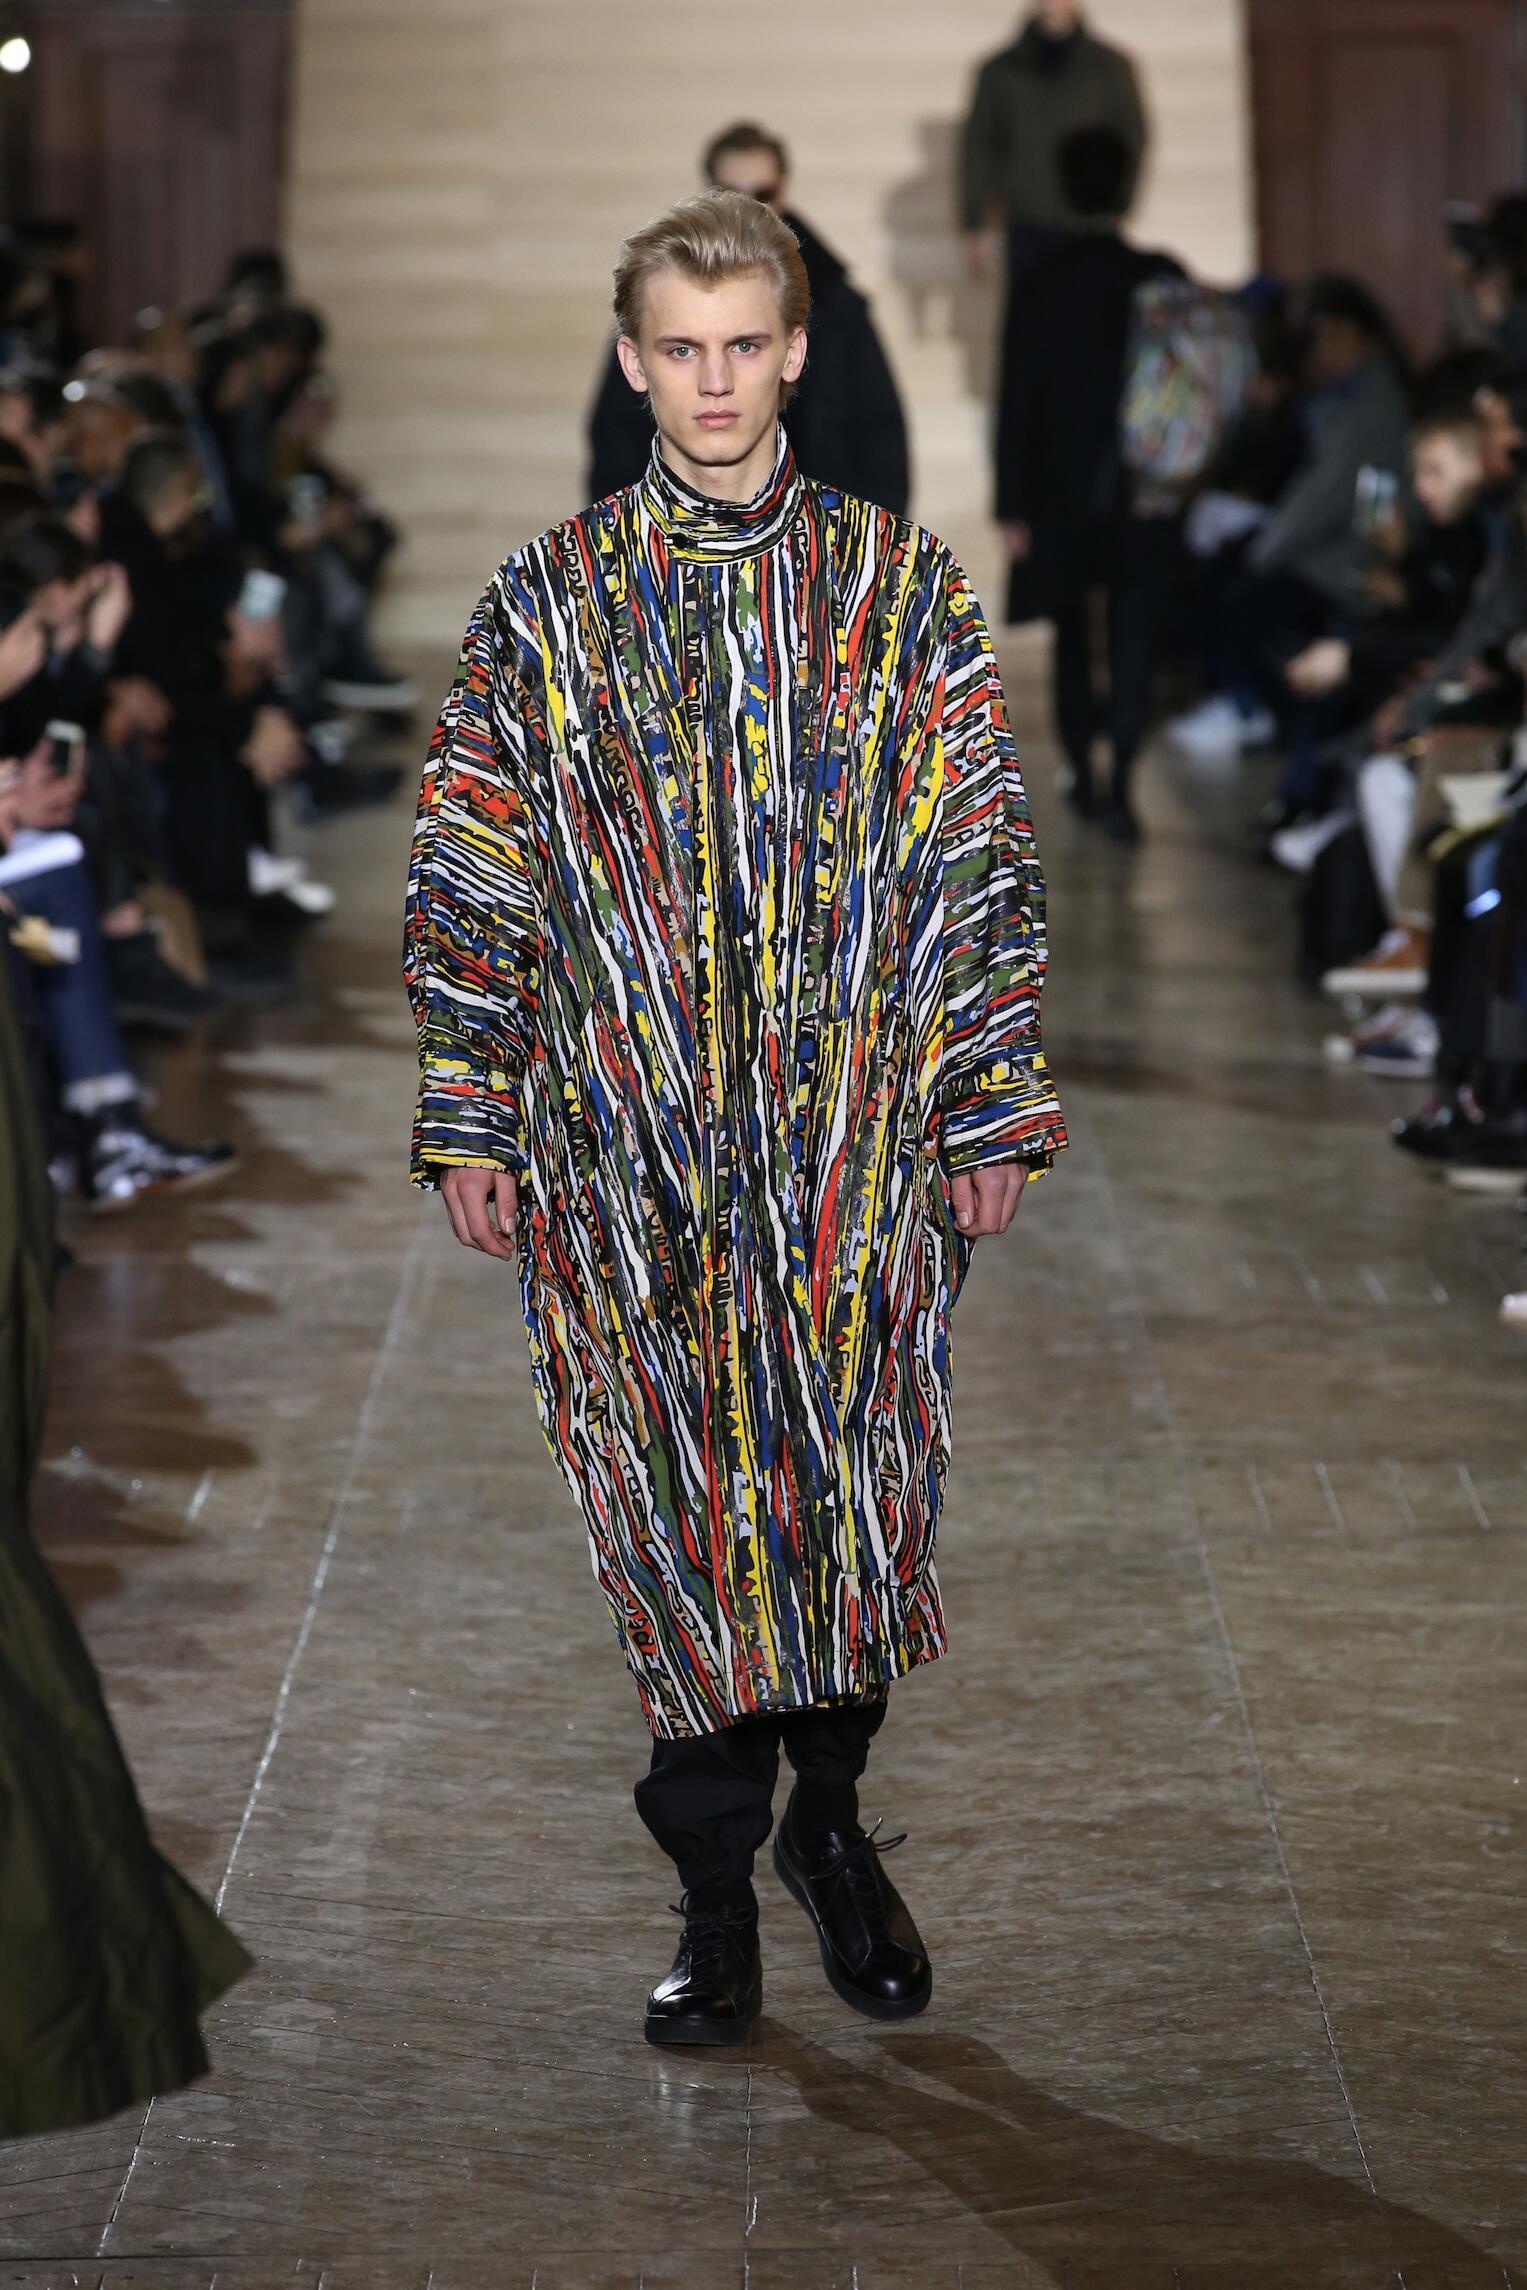 FW 2017-18 Fashion Show Issey Miyake